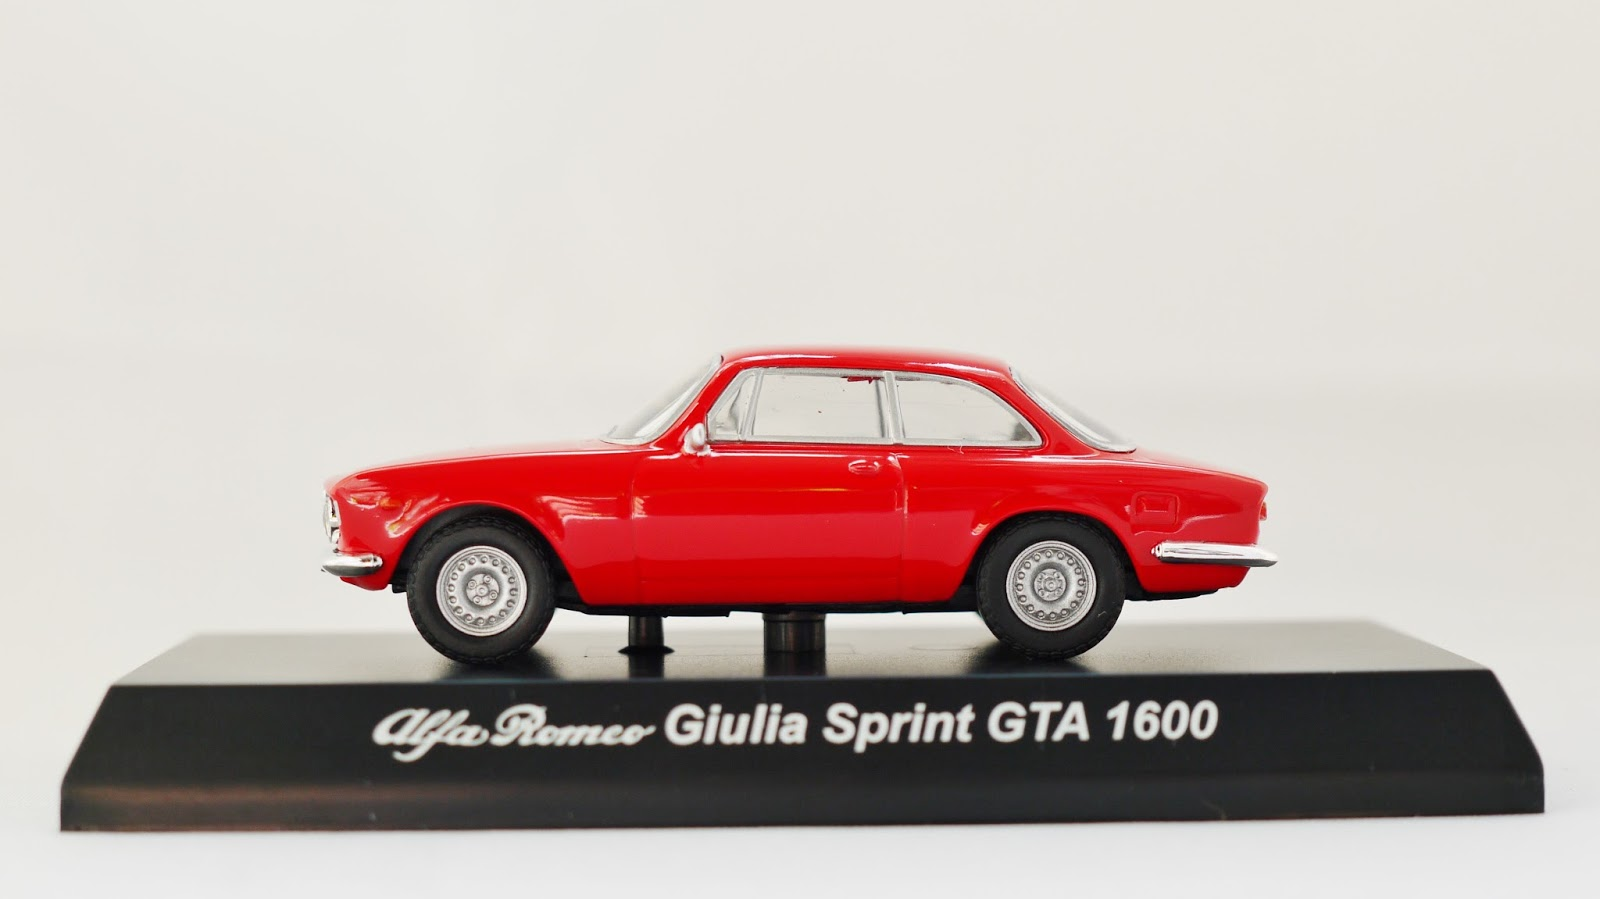 Kyosho 1 64 Minicar Collection Alfa Romeo Series Decorate For Giulia Sprint Gta 1300 Junior Red Color